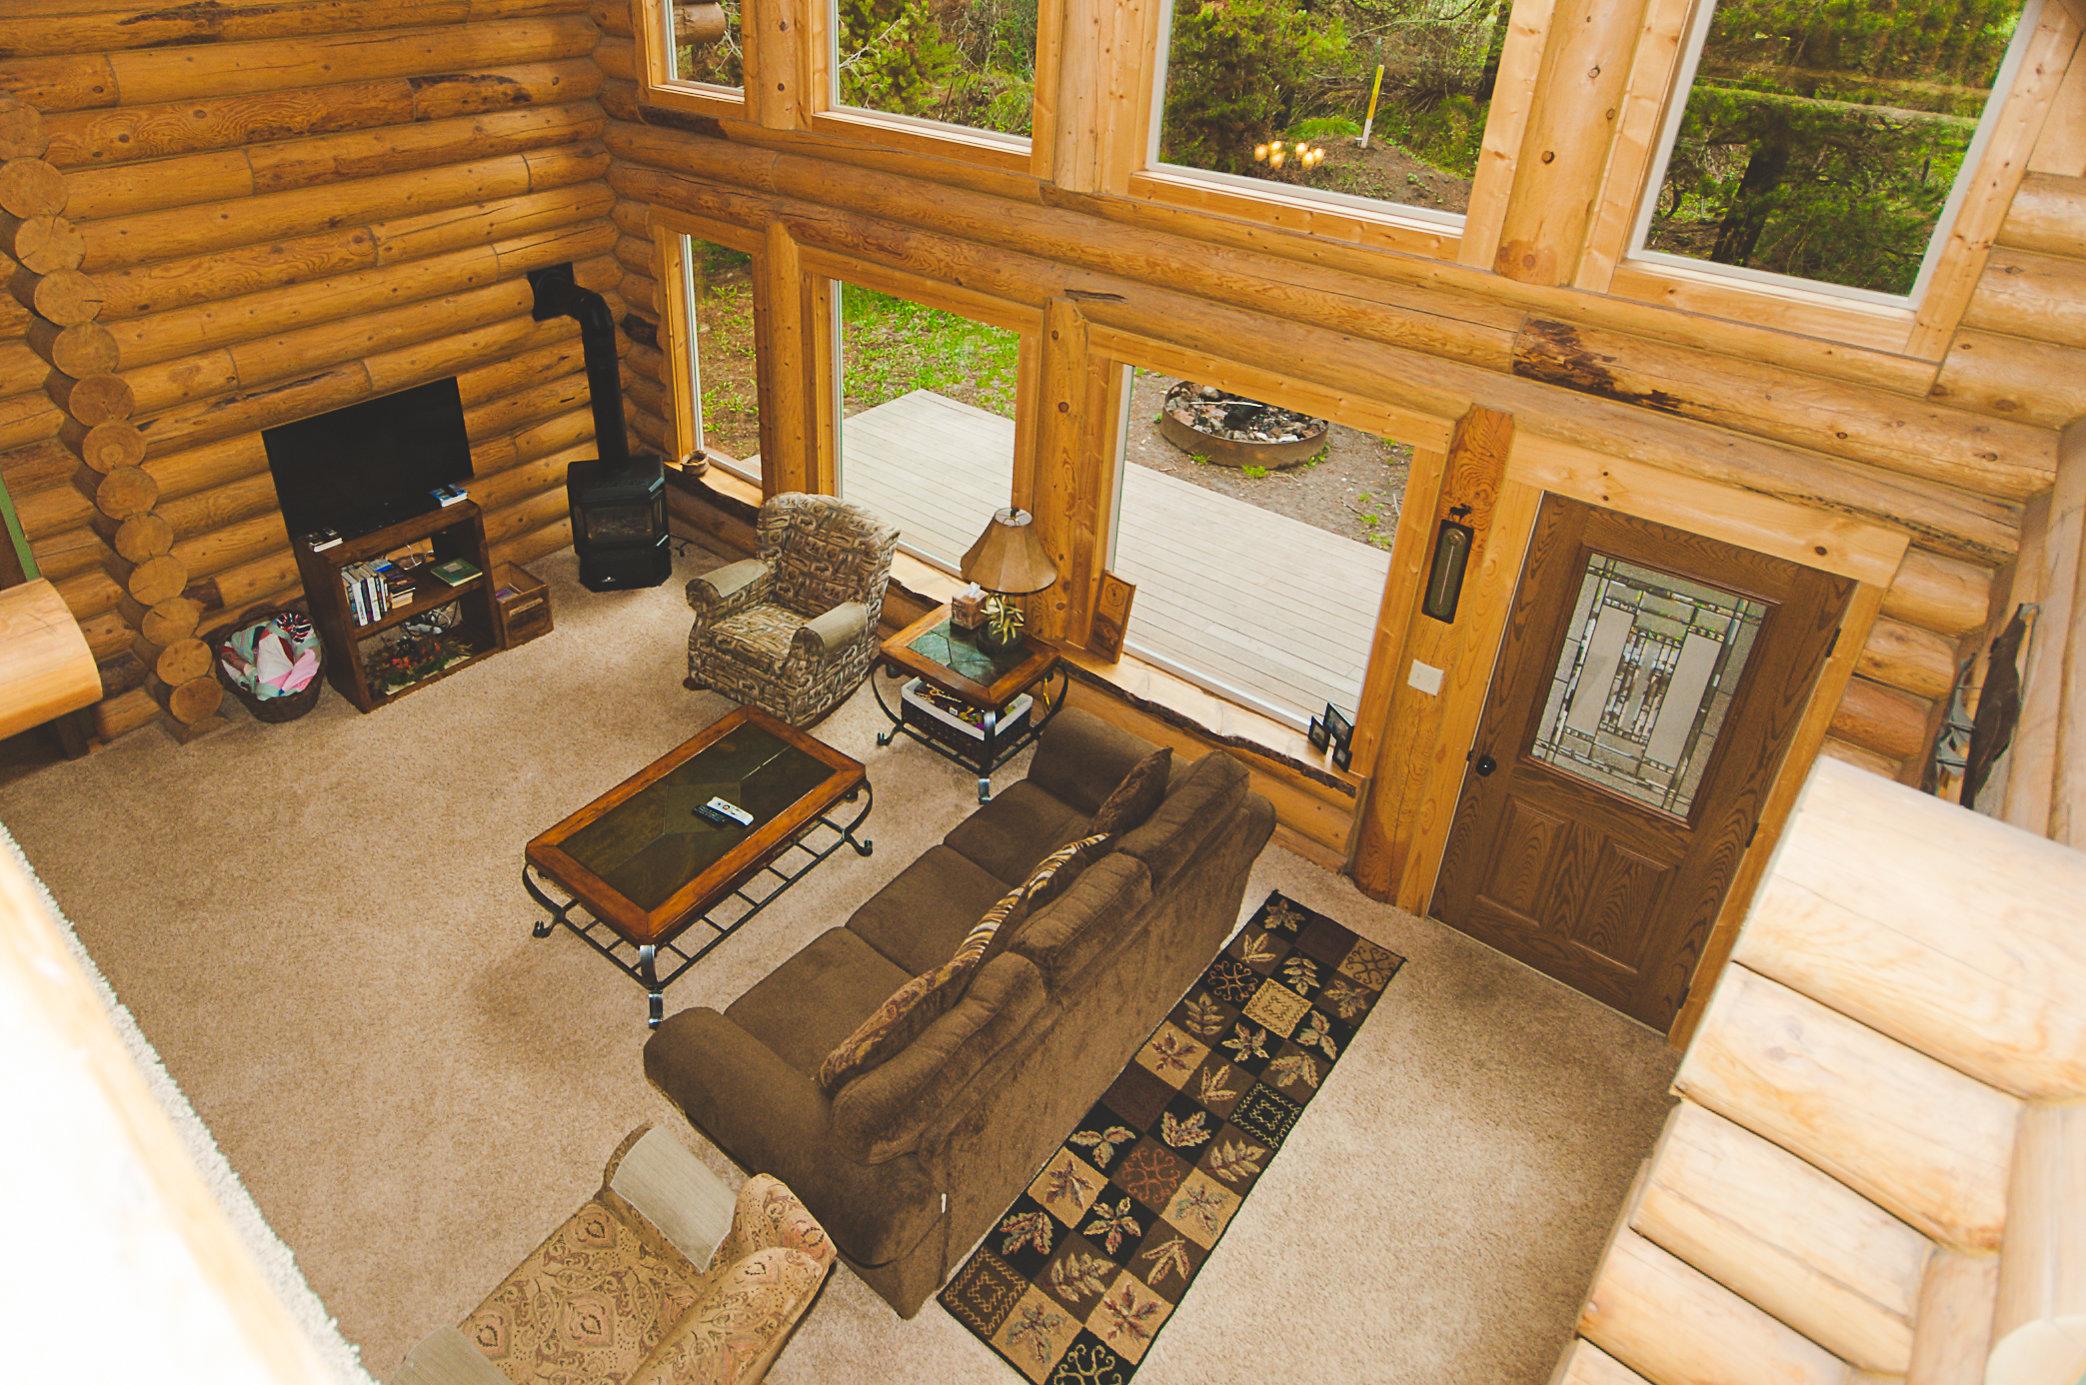 6. C16 Loft to Living Room